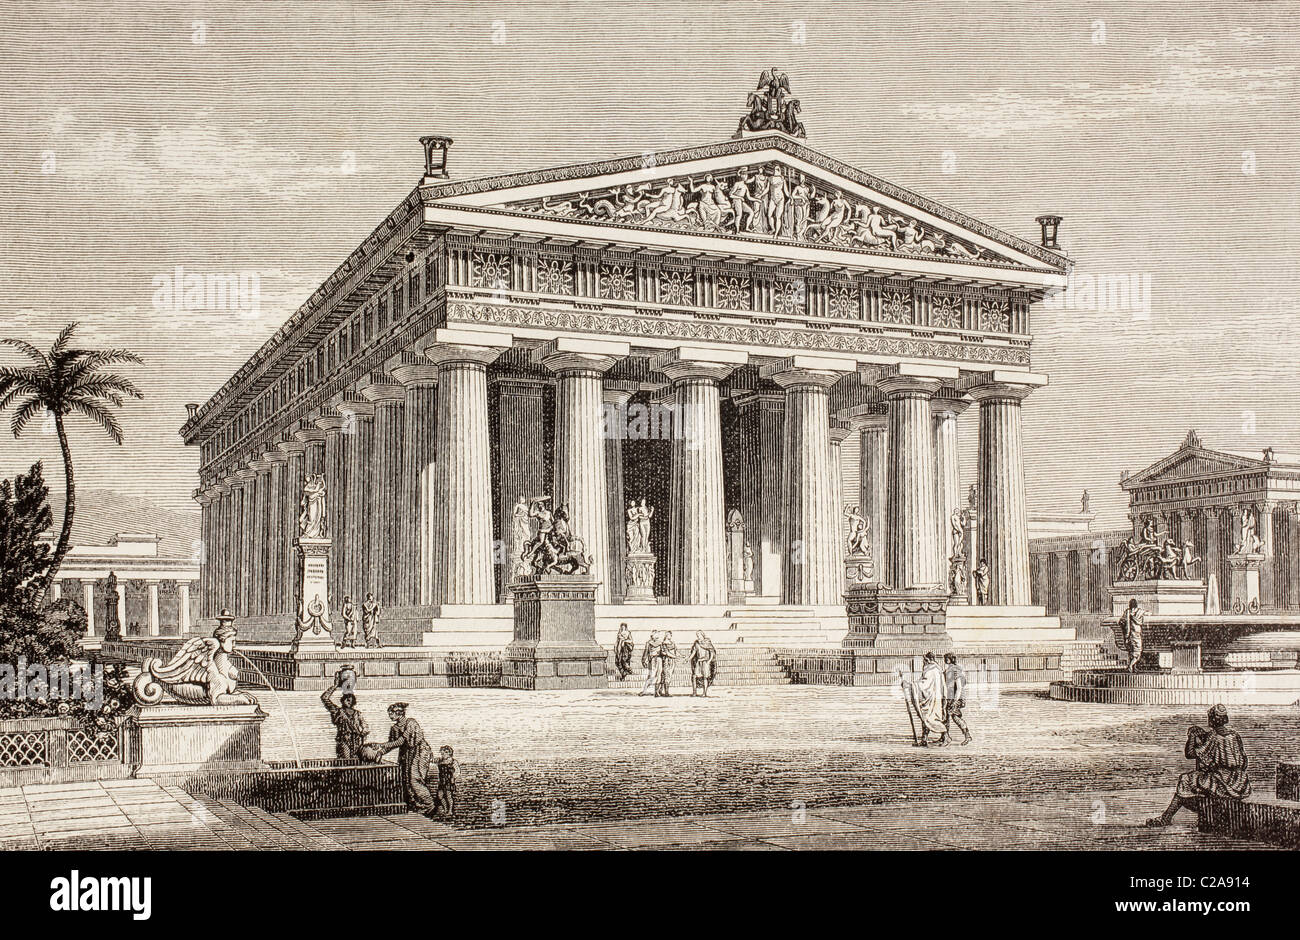 Artist's impression of the Temple of Poseidon, or Neptune, Paestum, Italy. - Stock Image